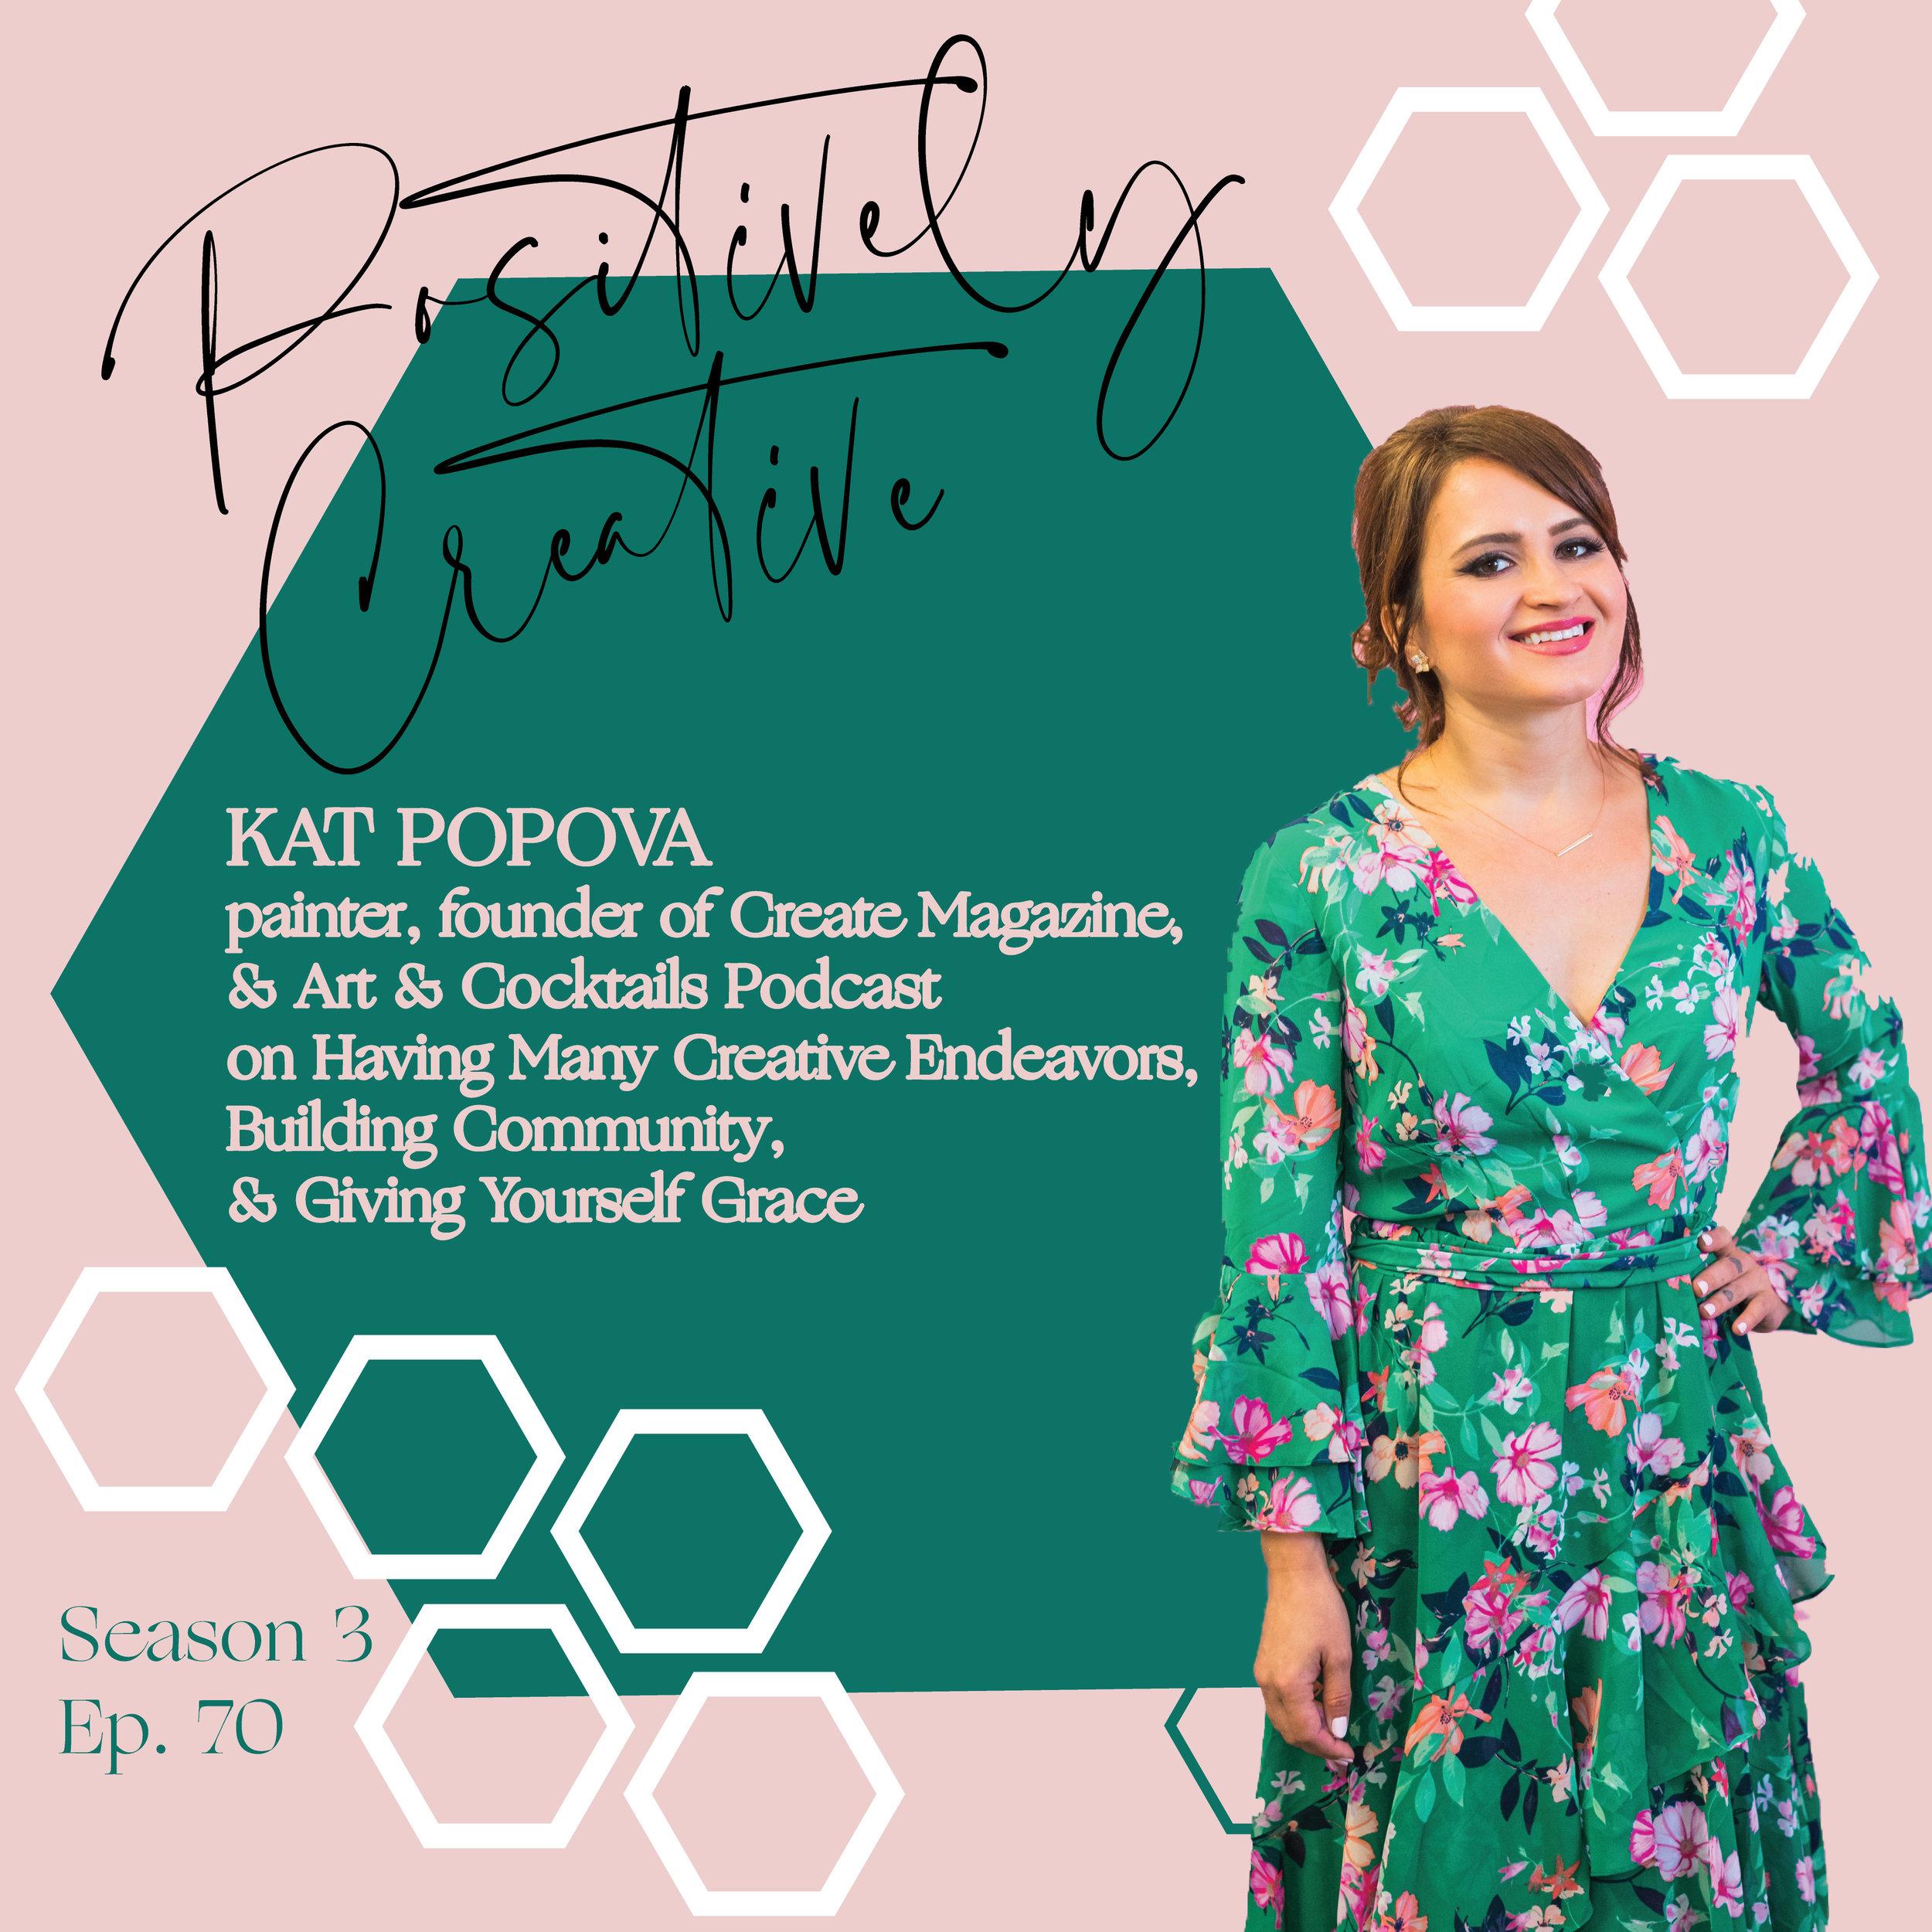 s3-ep-70-positively-creative-podcast-cover-ekaterina-popova.jpg